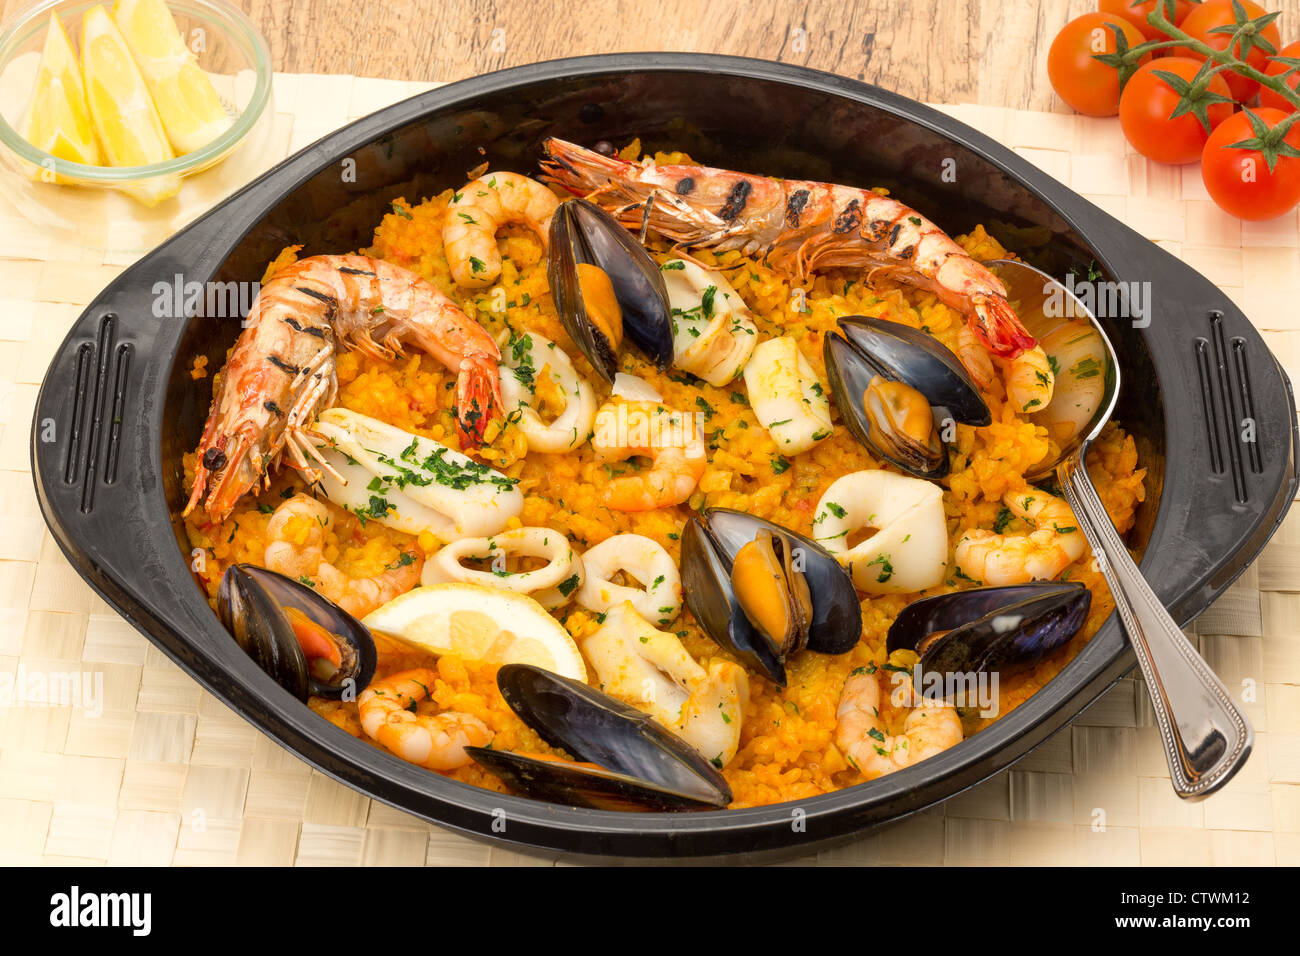 Seafood paella in a black paella serving dish - Stock Image